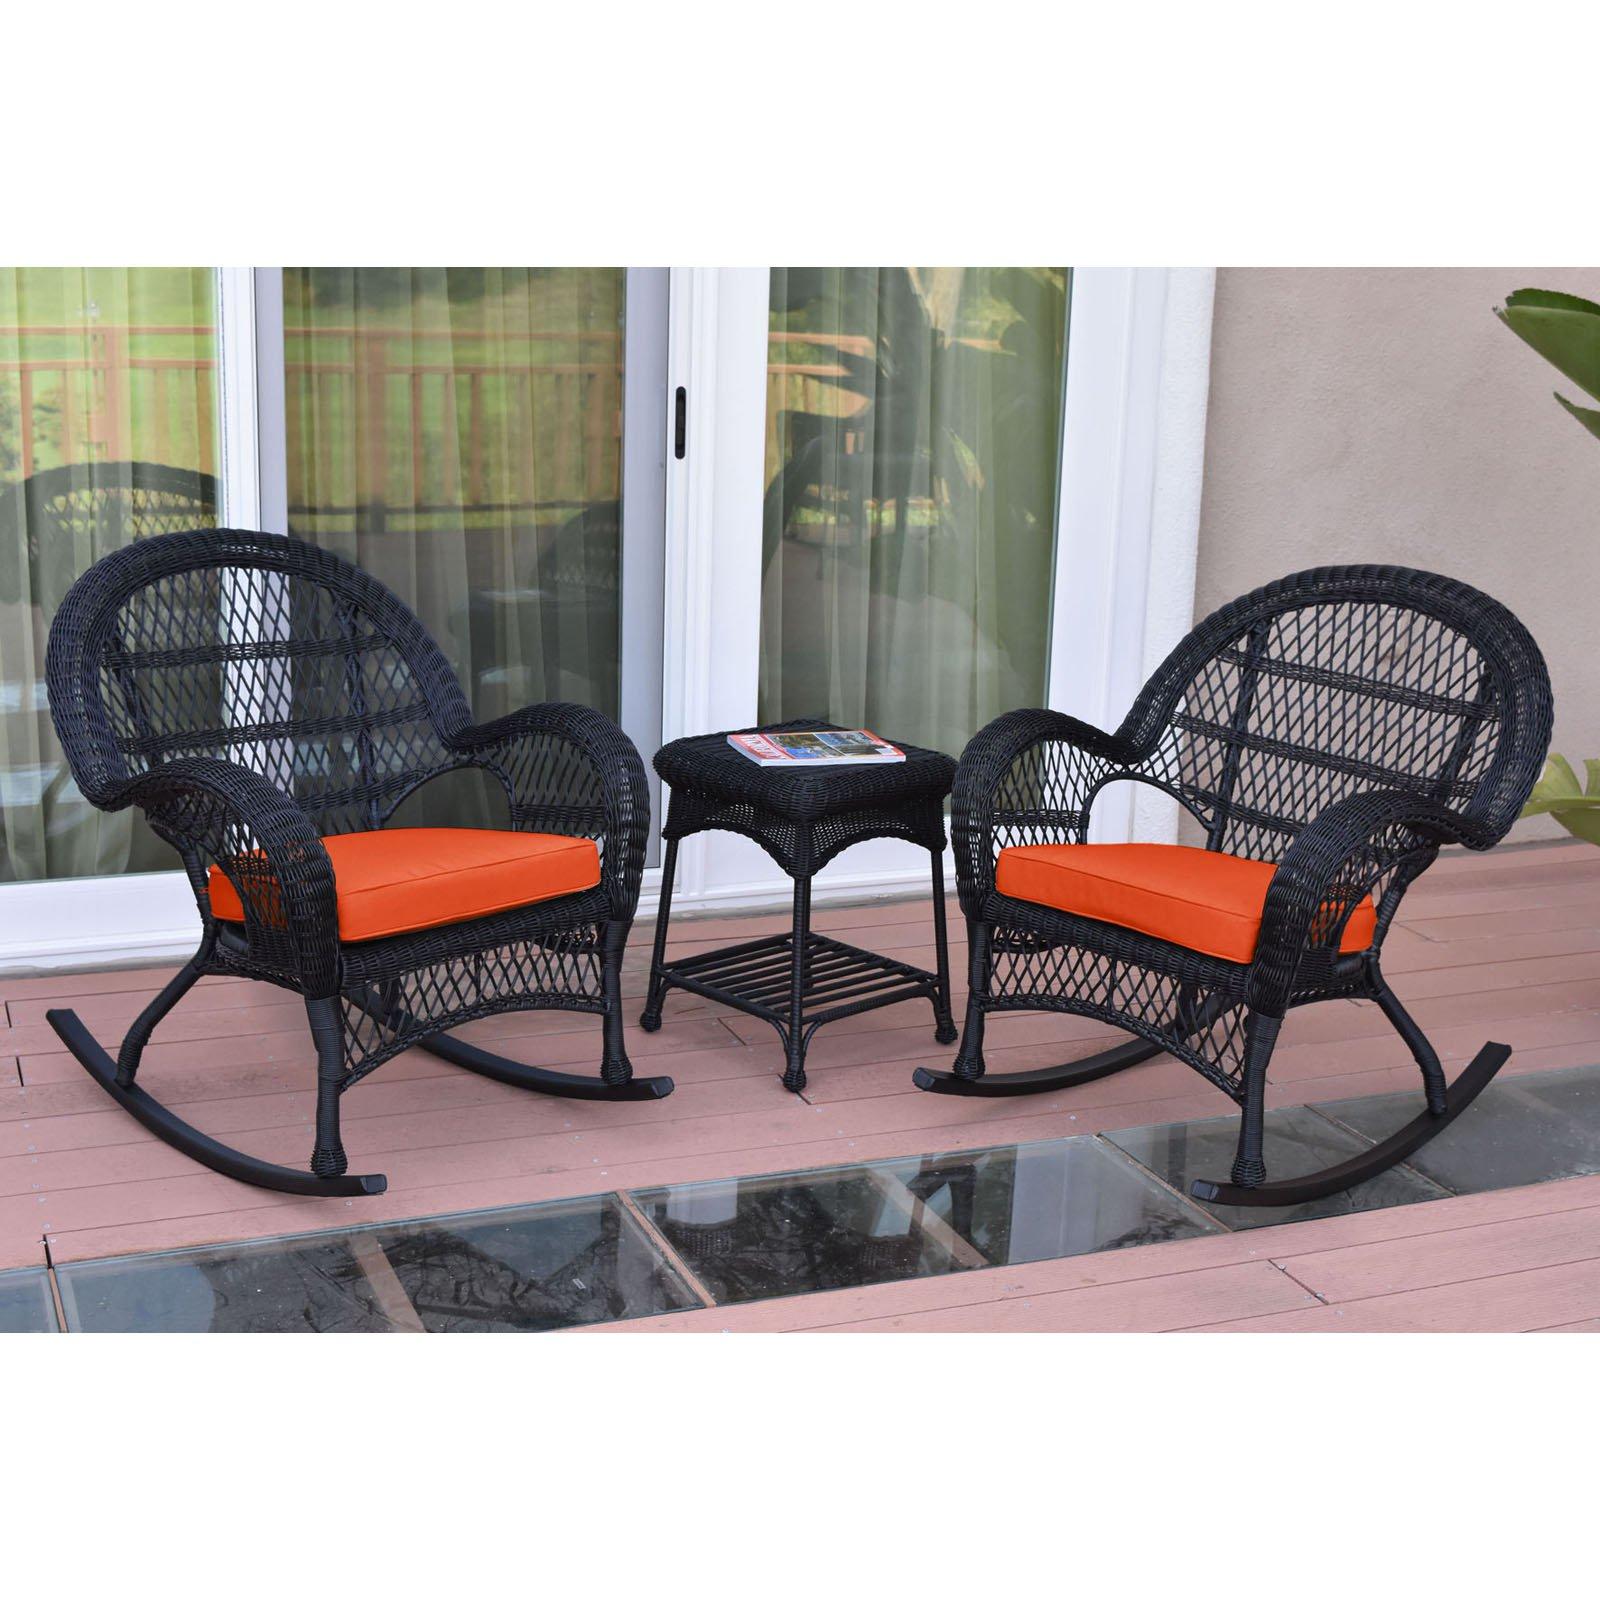 Jeco Santa Maria 3 Piece Wicker Rocker Chat Set with Optional Cushion